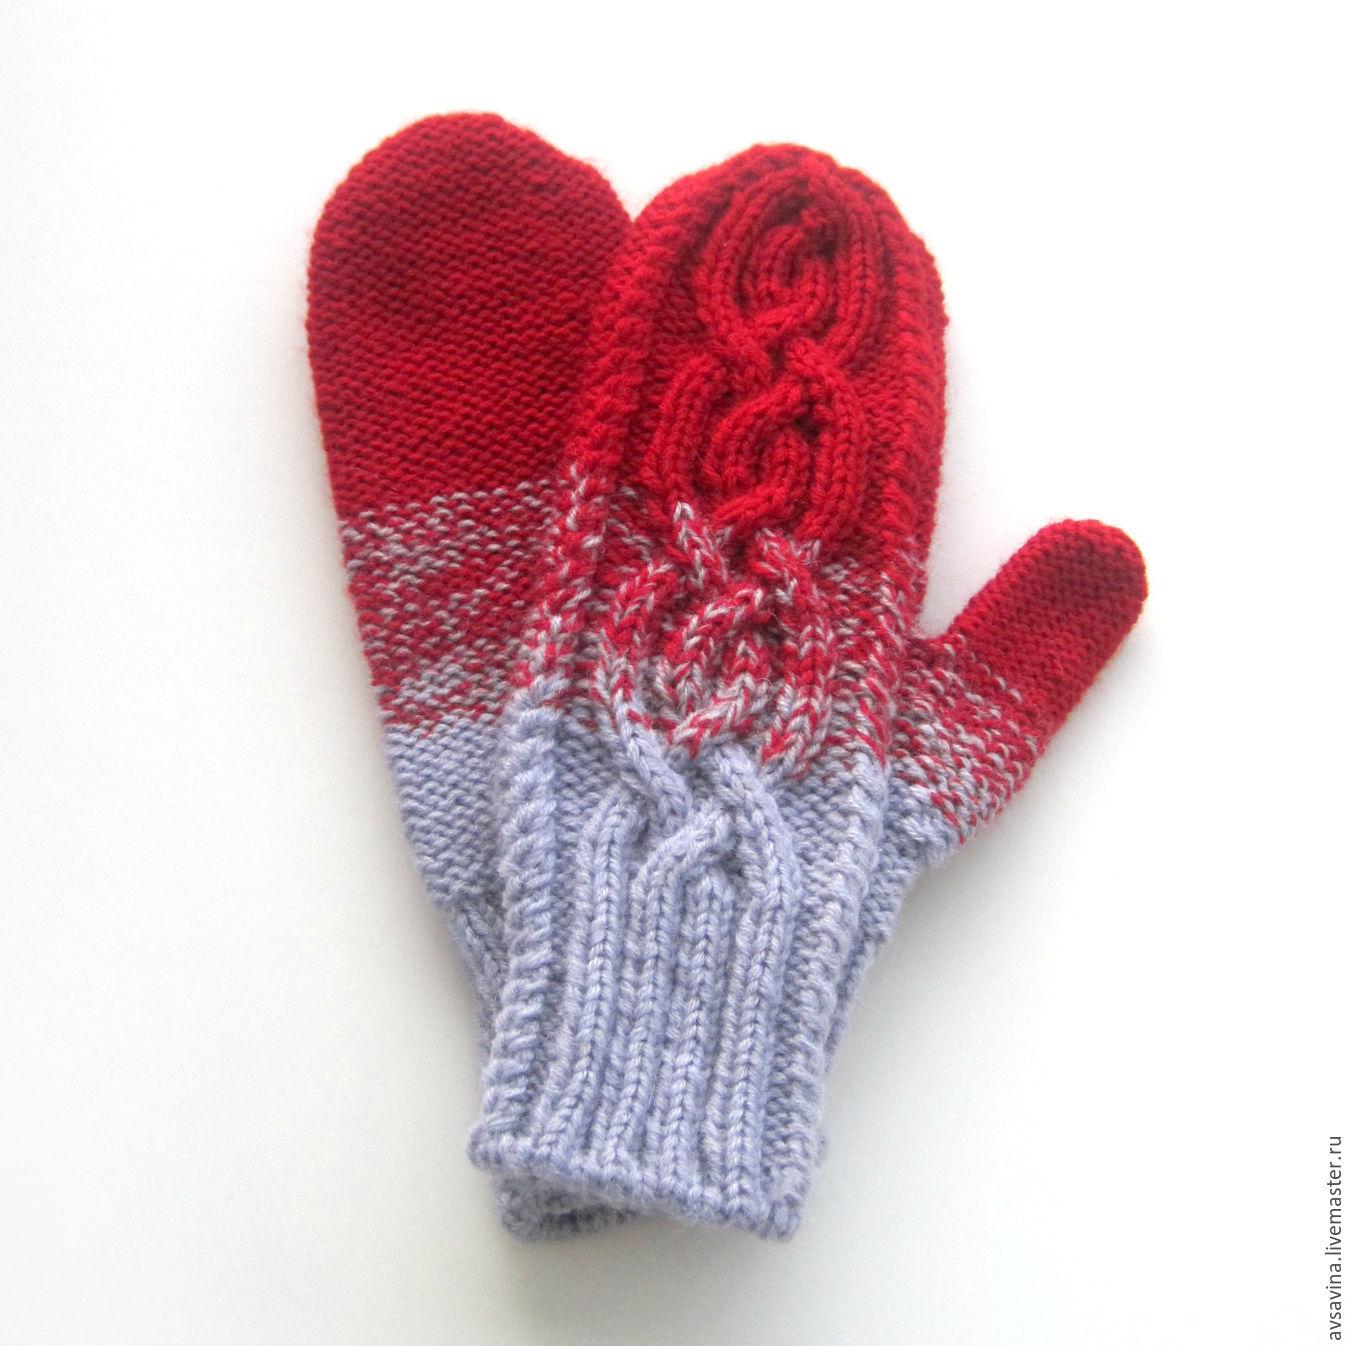 Вязание спицами варежки рукавицы